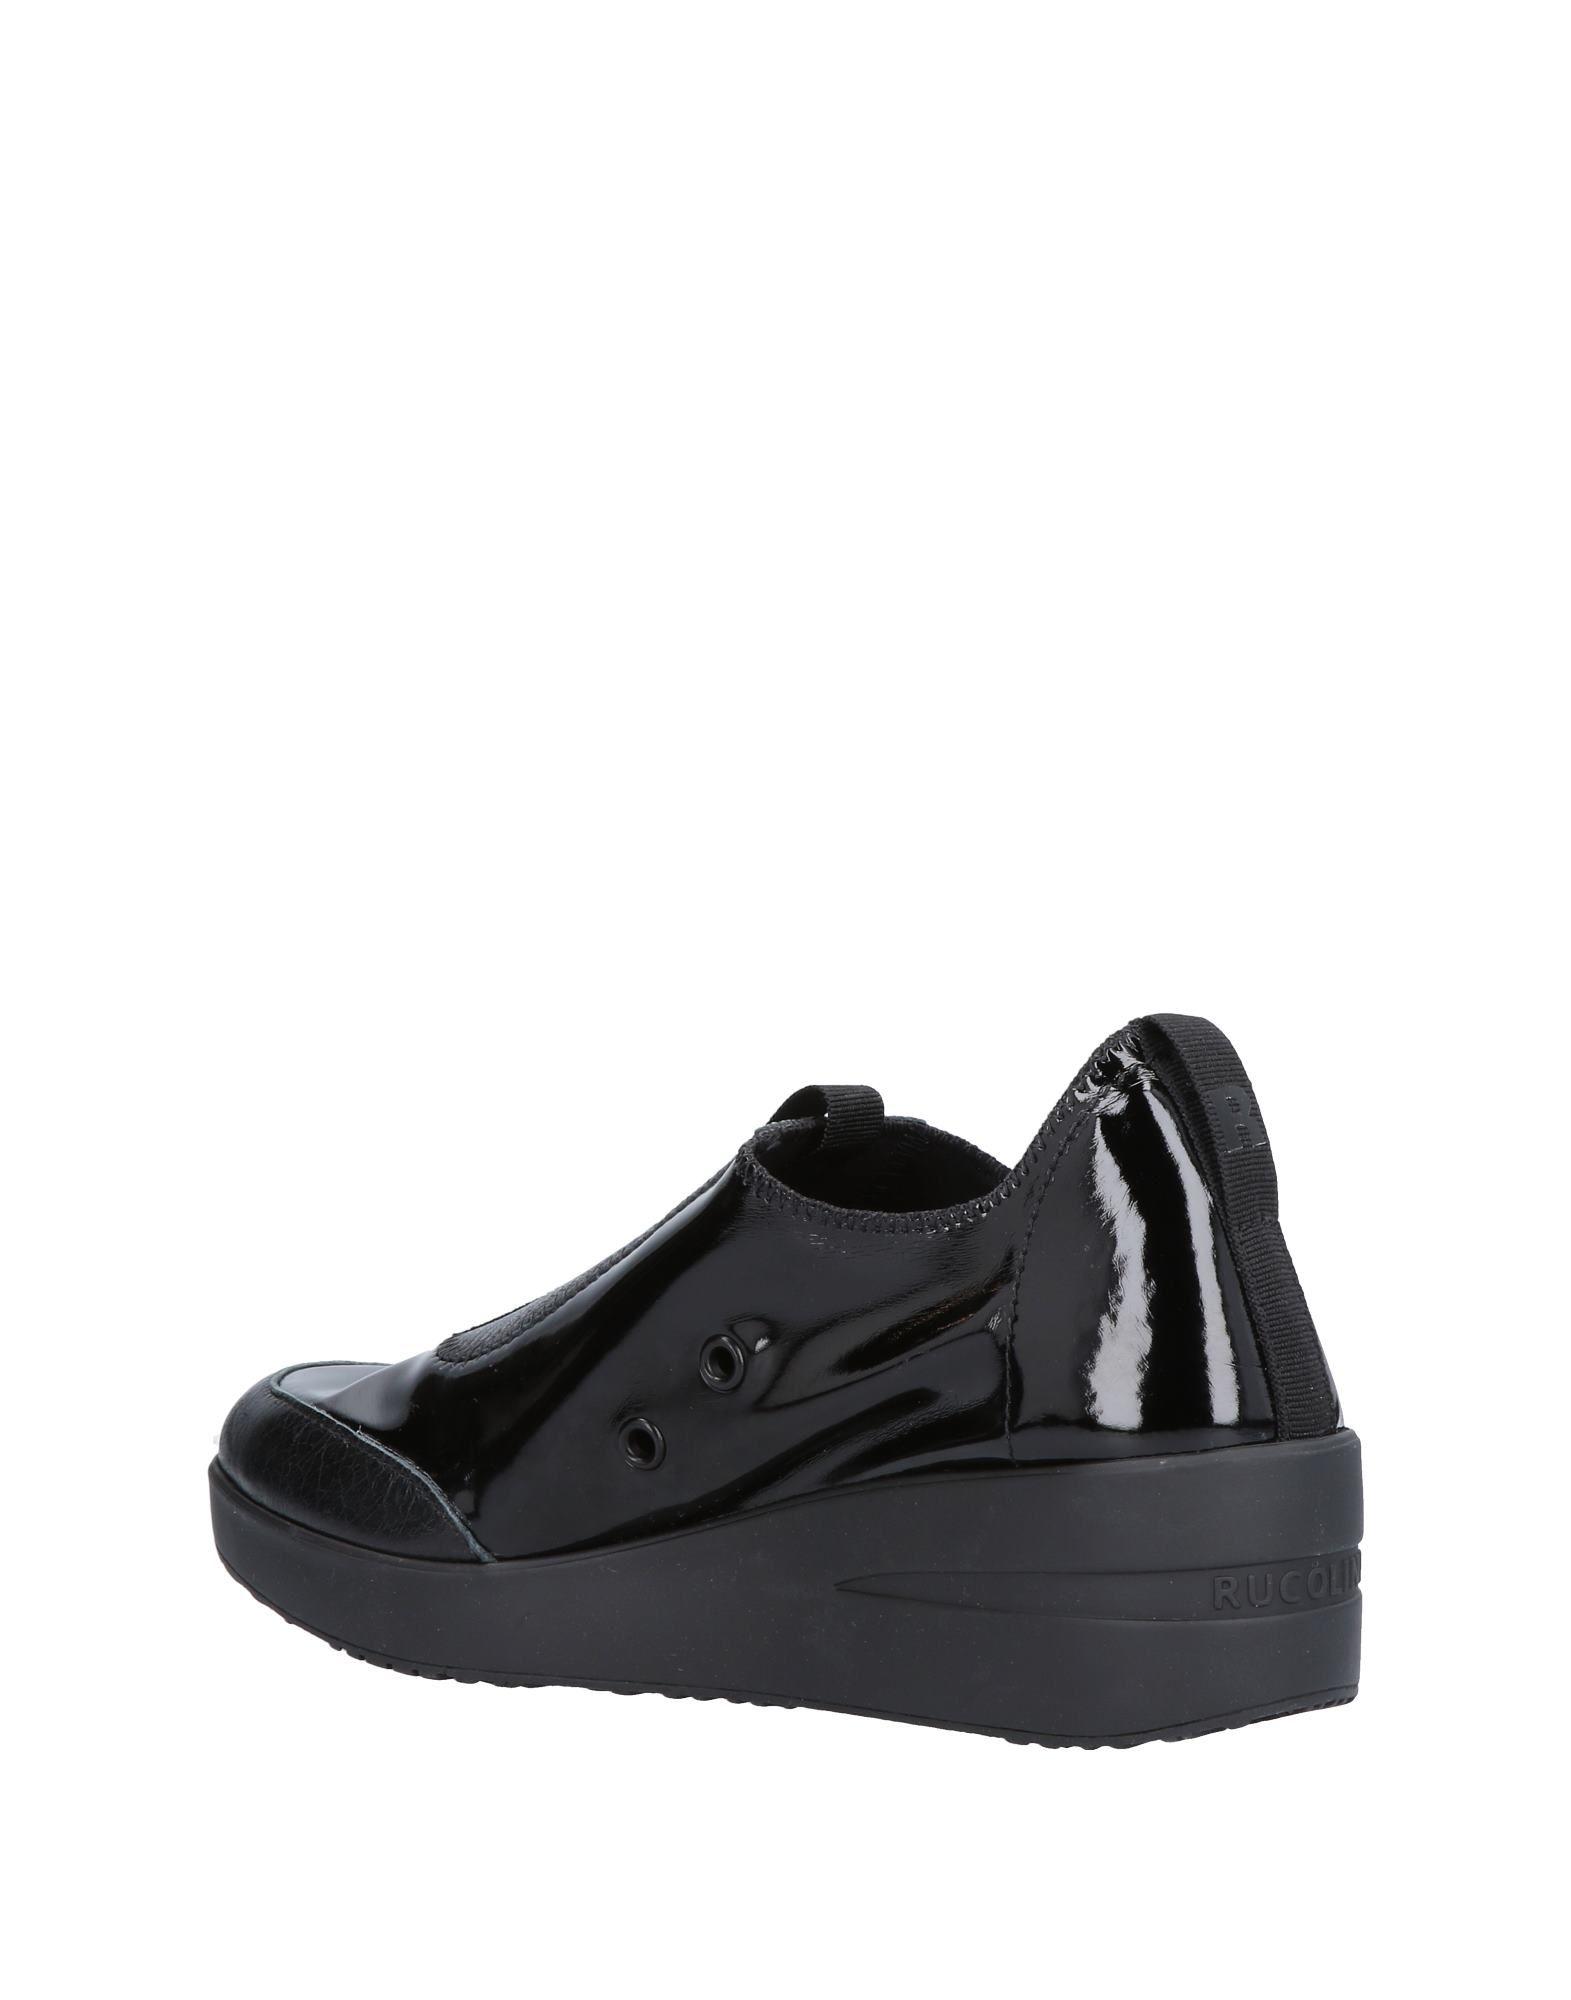 Ruco Line Damen Sneakers Damen Line  11478243LW  e814c8